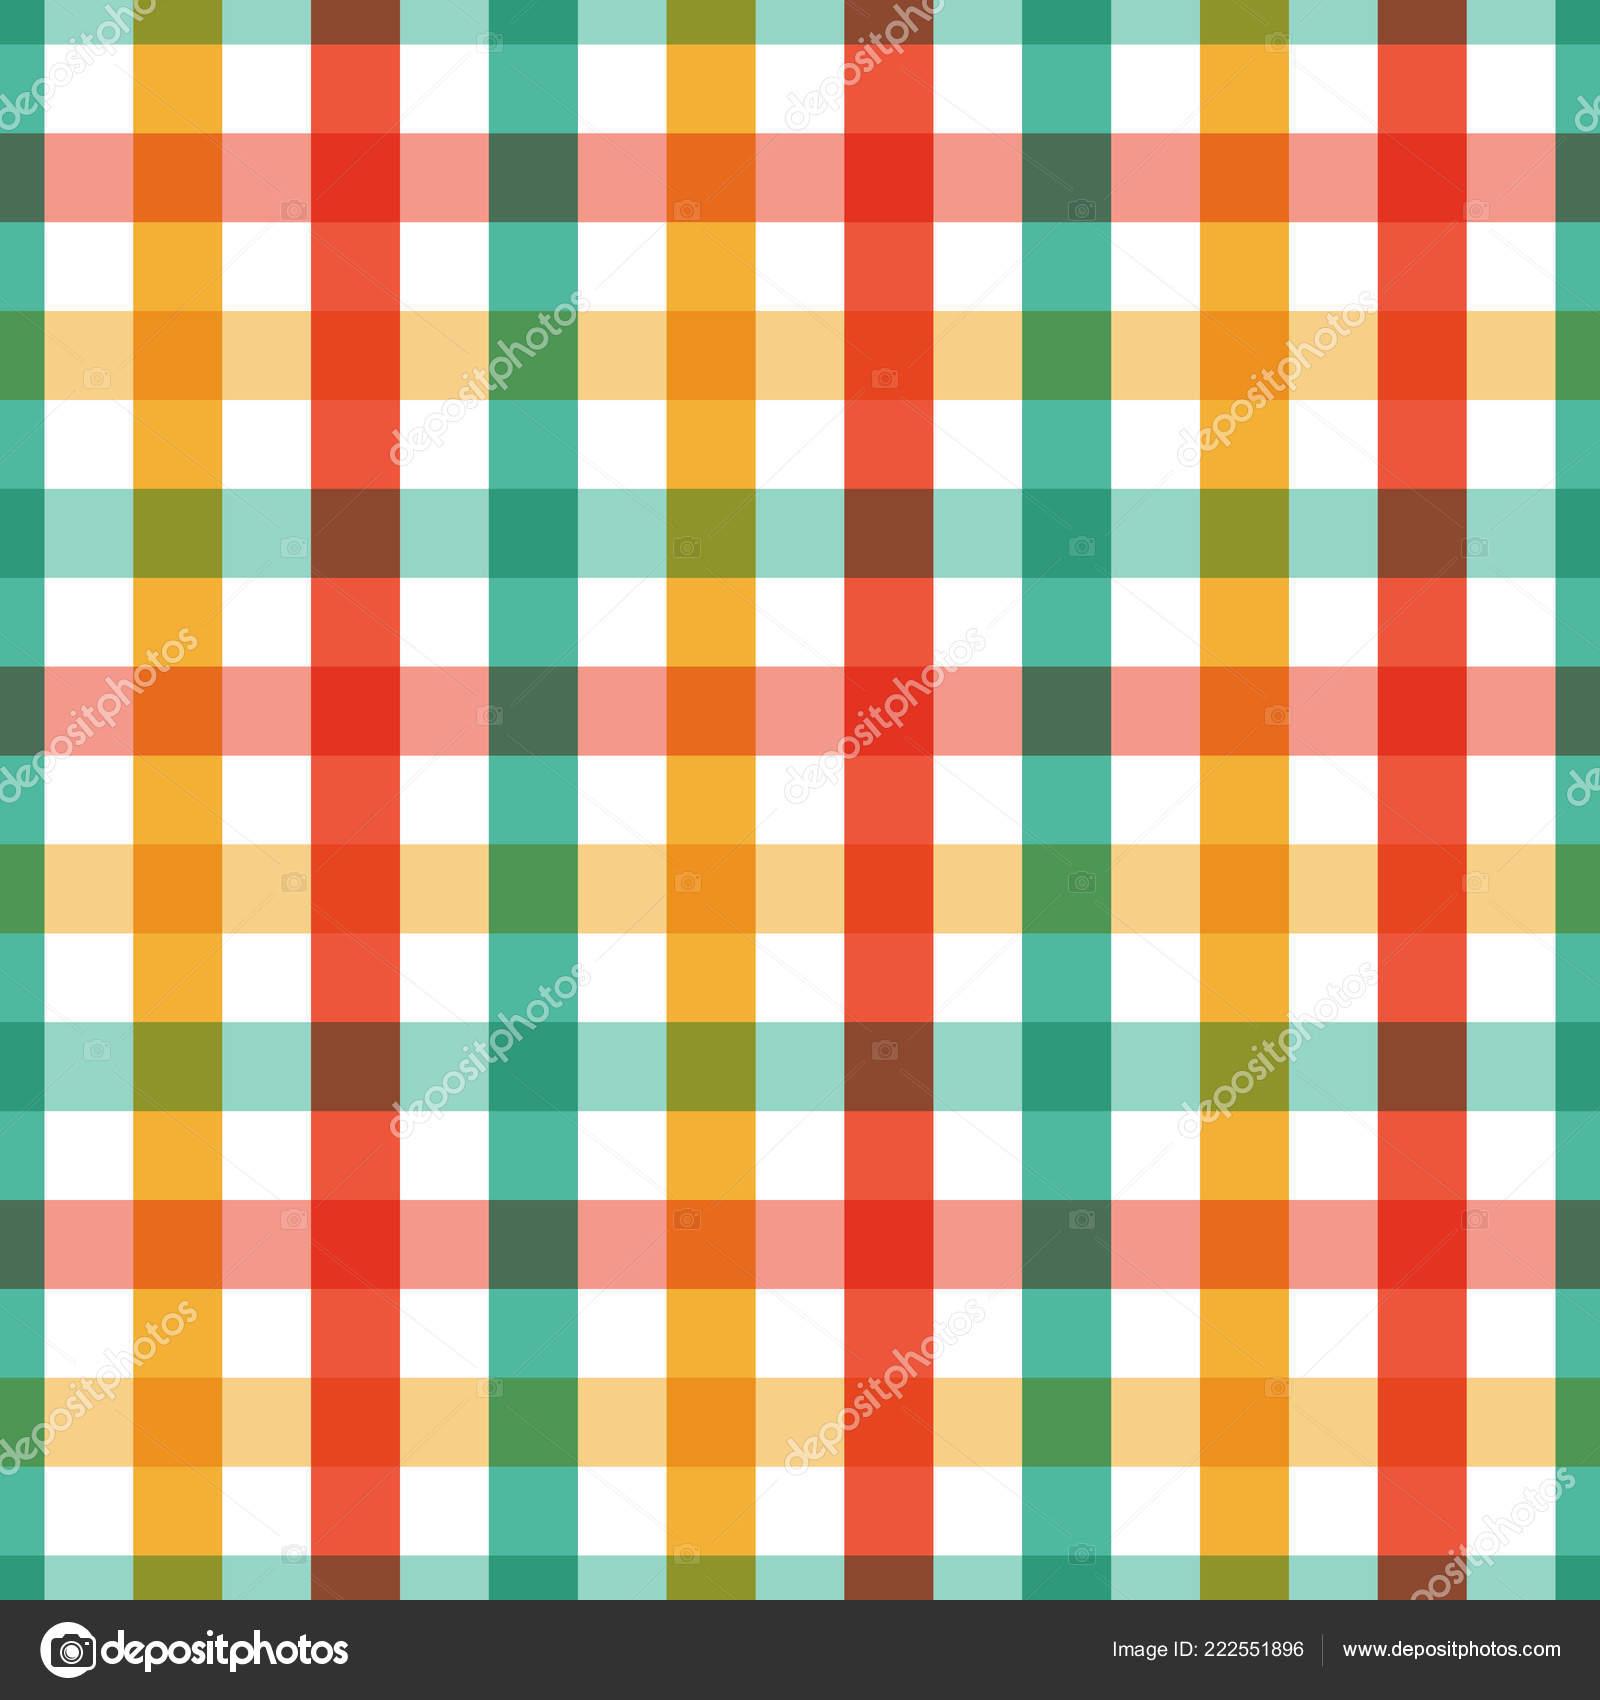 Seamless Texture Geometric Vector